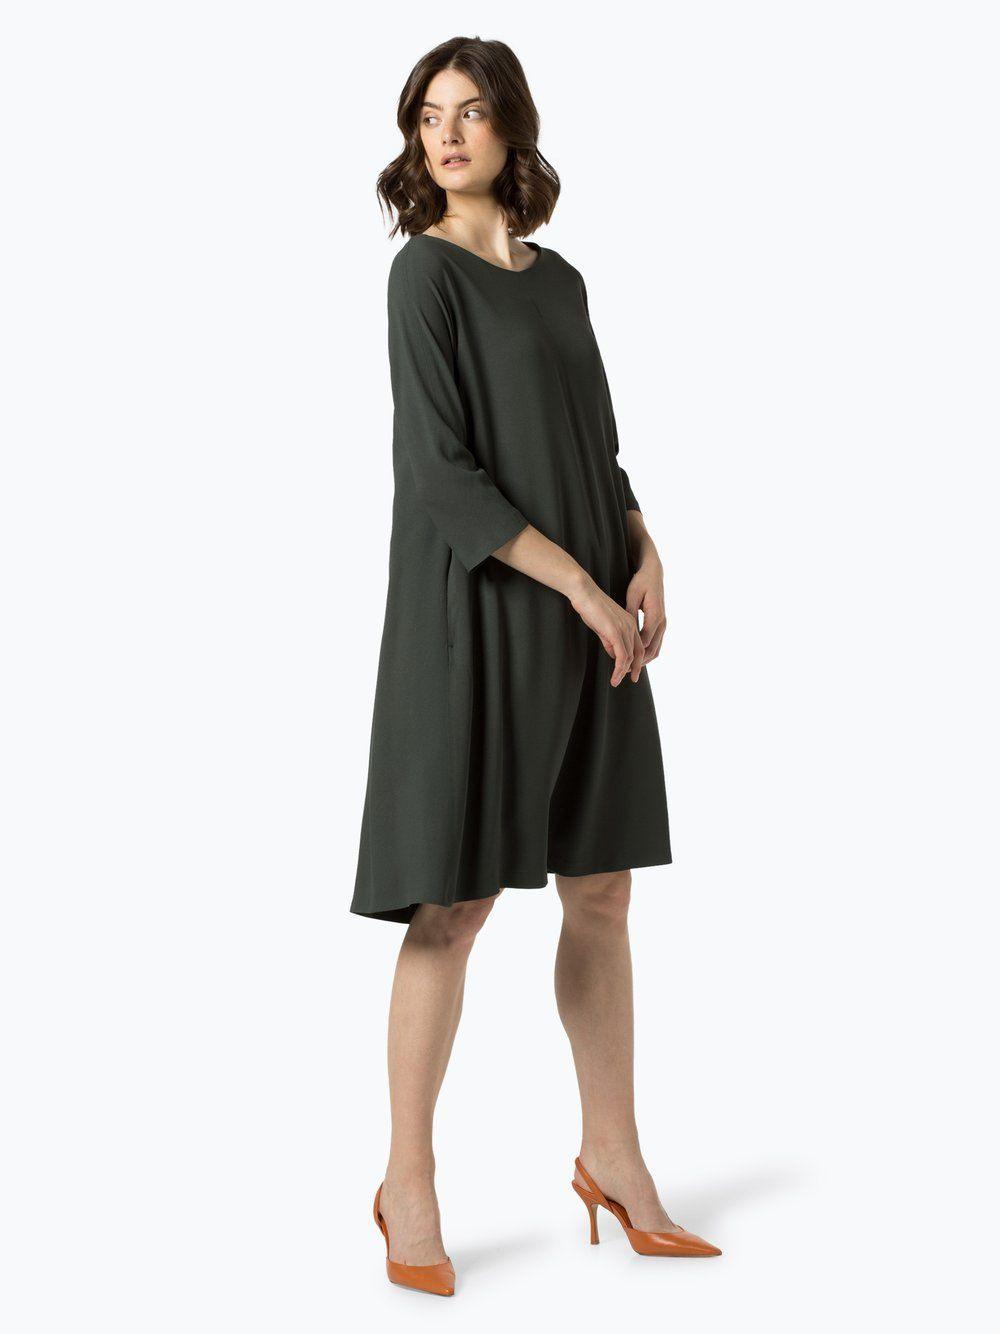 15 Großartig Max Mara Abendkleid Vertrieb15 Luxurius Max Mara Abendkleid Stylish